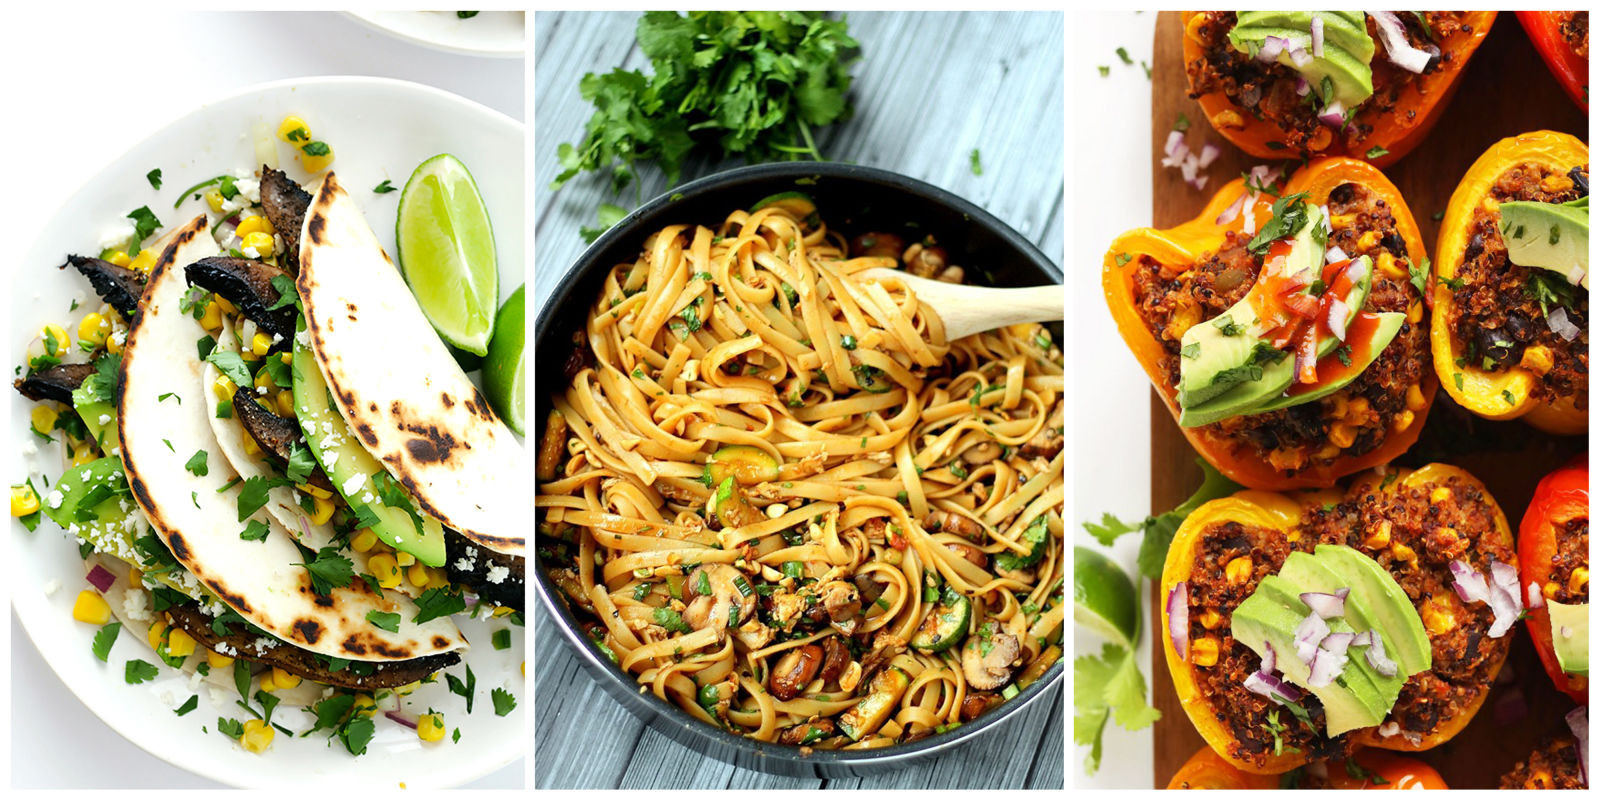 Simple Weeknight Dinners  10 Easy Weeknight Dinner Recipes Fast Healthy Meal Ideas